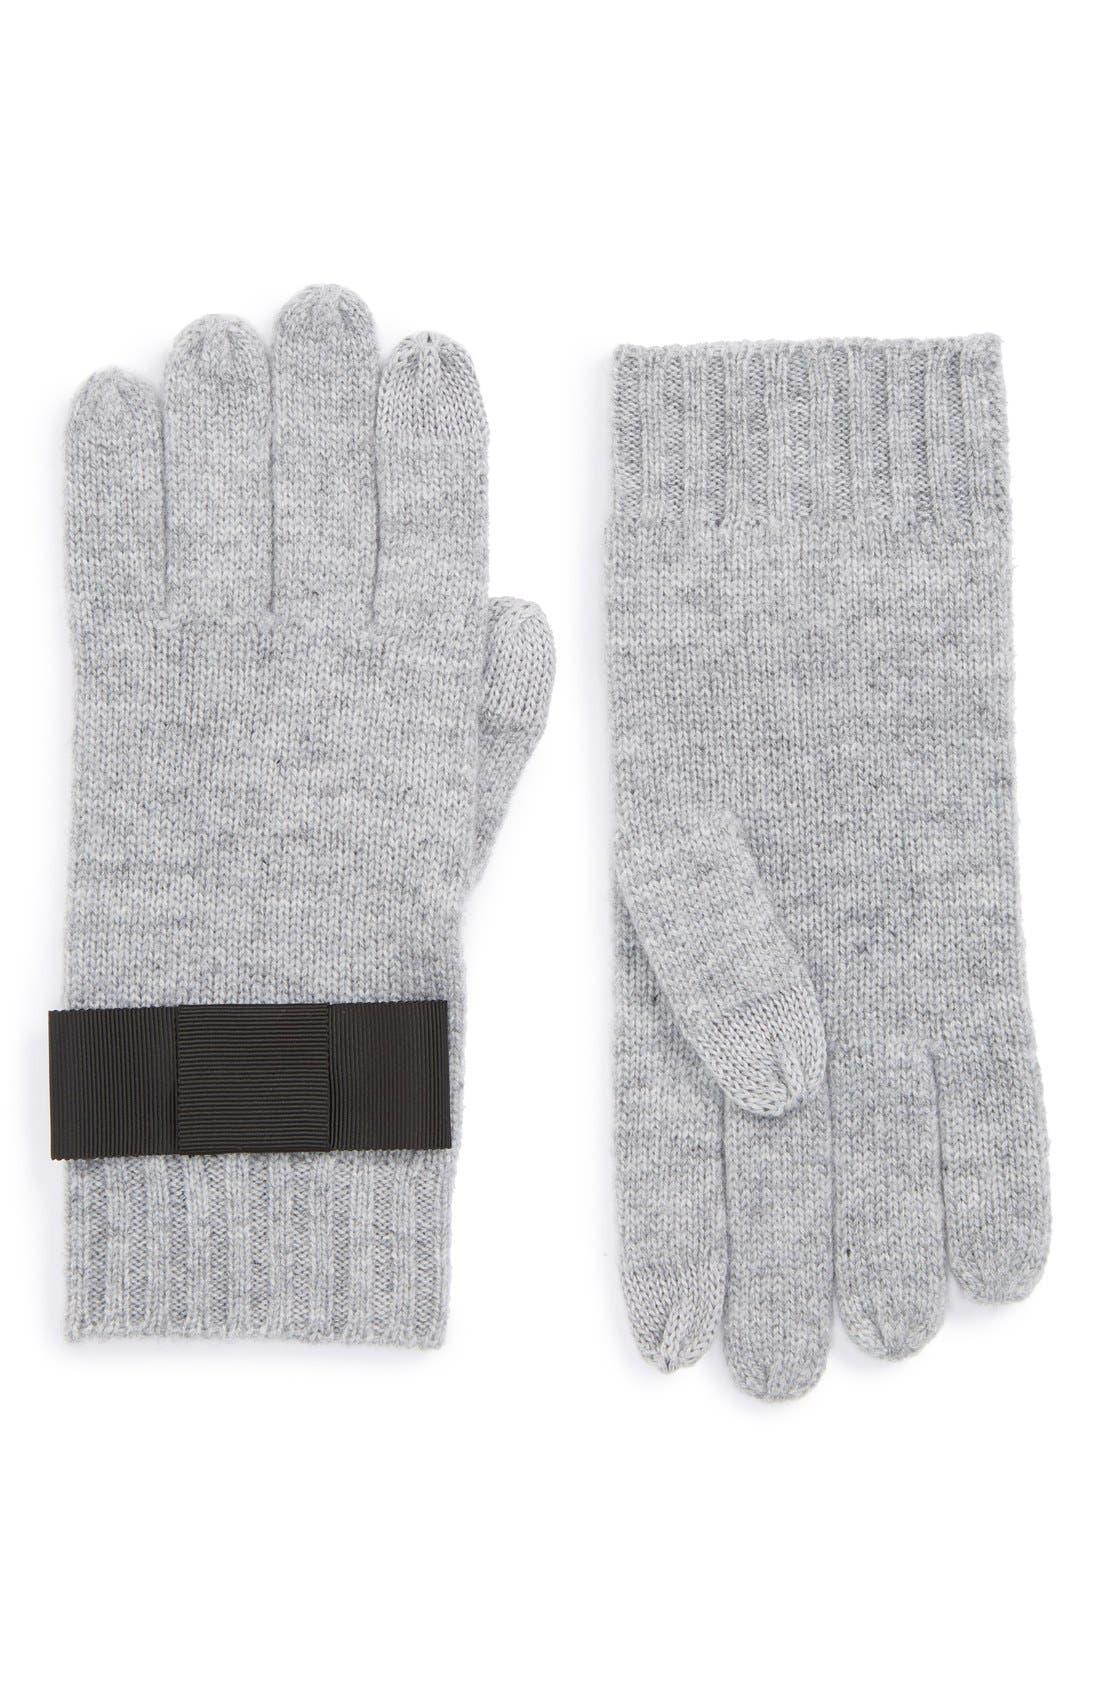 Alternate Image 1 Selected - kate spade new york grosgrain bow knit tech gloves